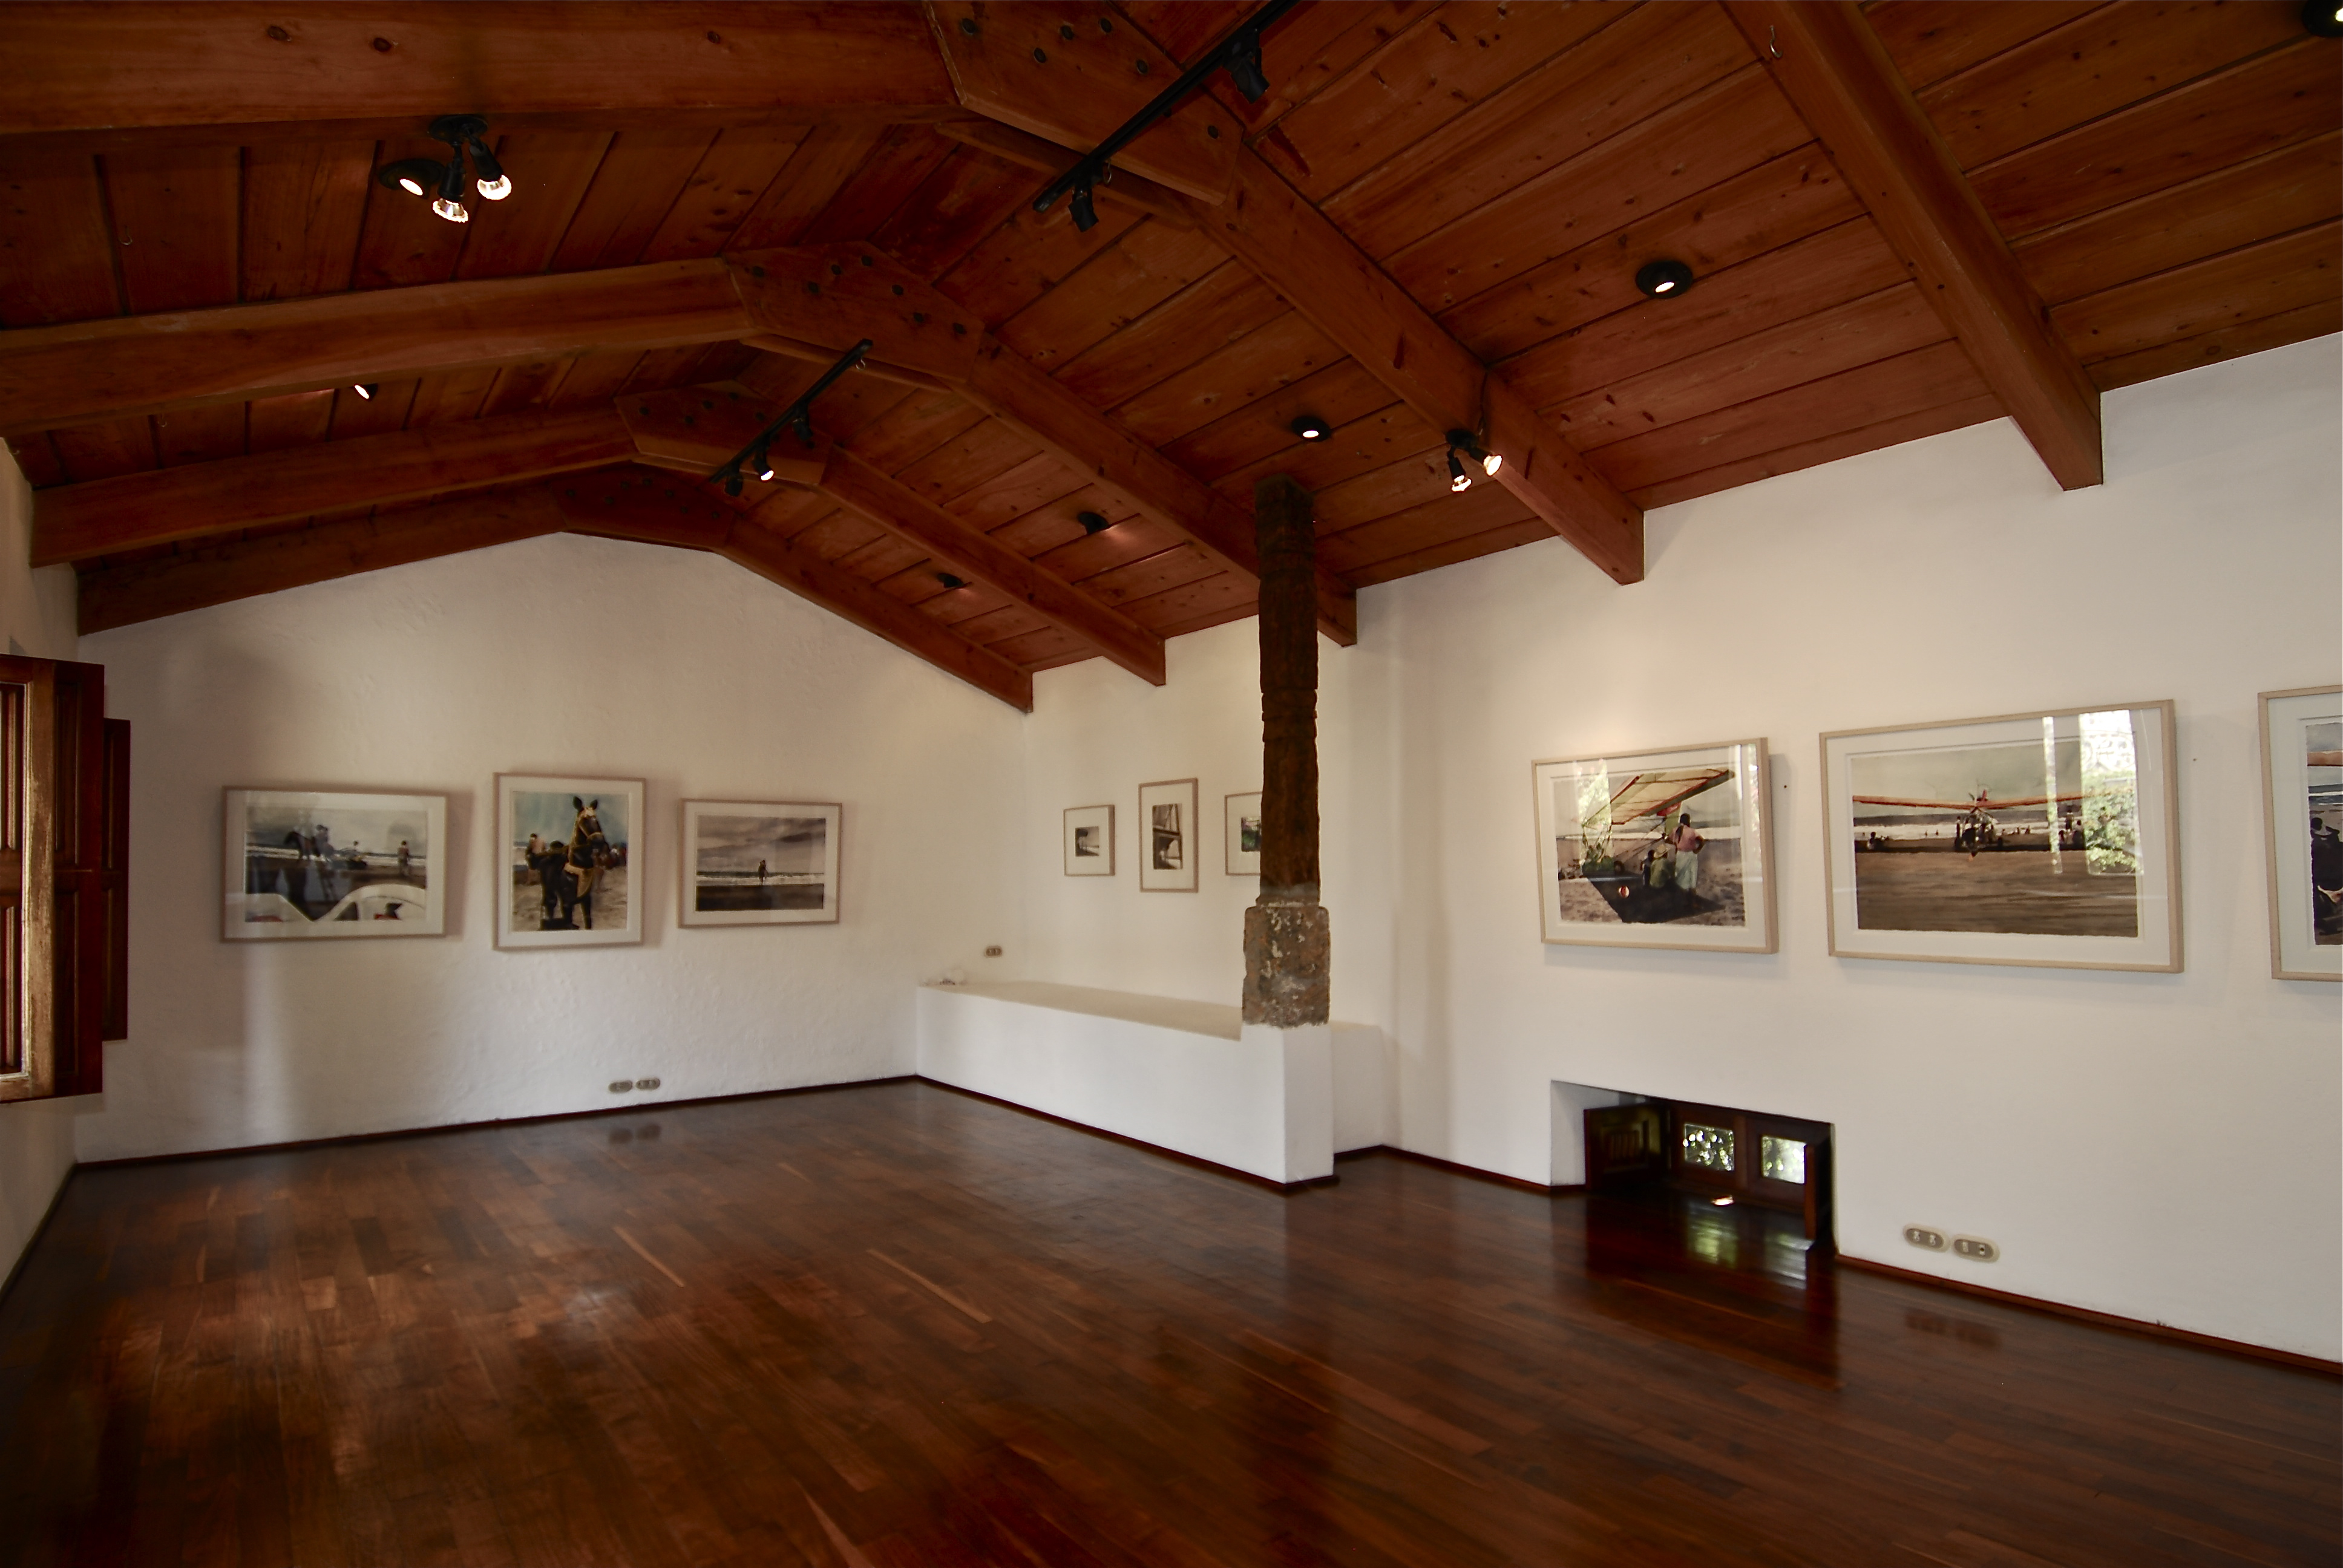 Meson Panza Verde Art Gallery